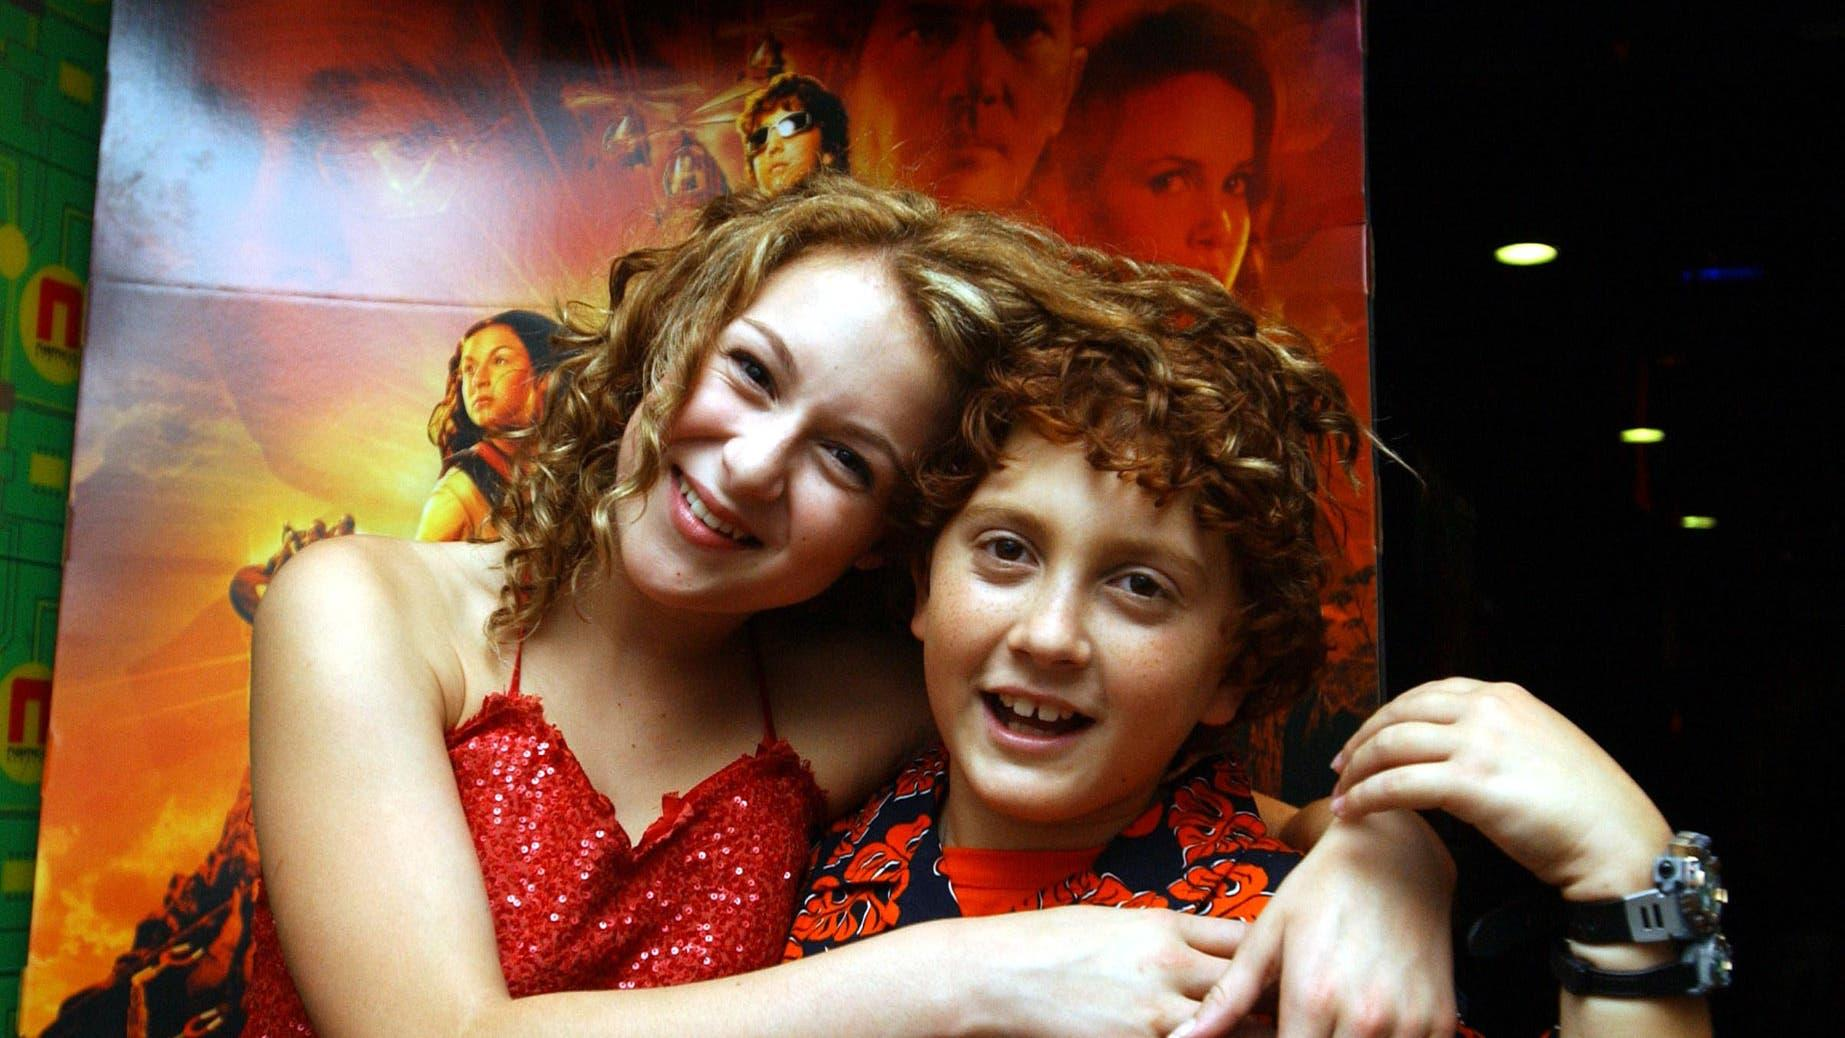 Spy Kids reboot in the works from director Robert Rodriguez